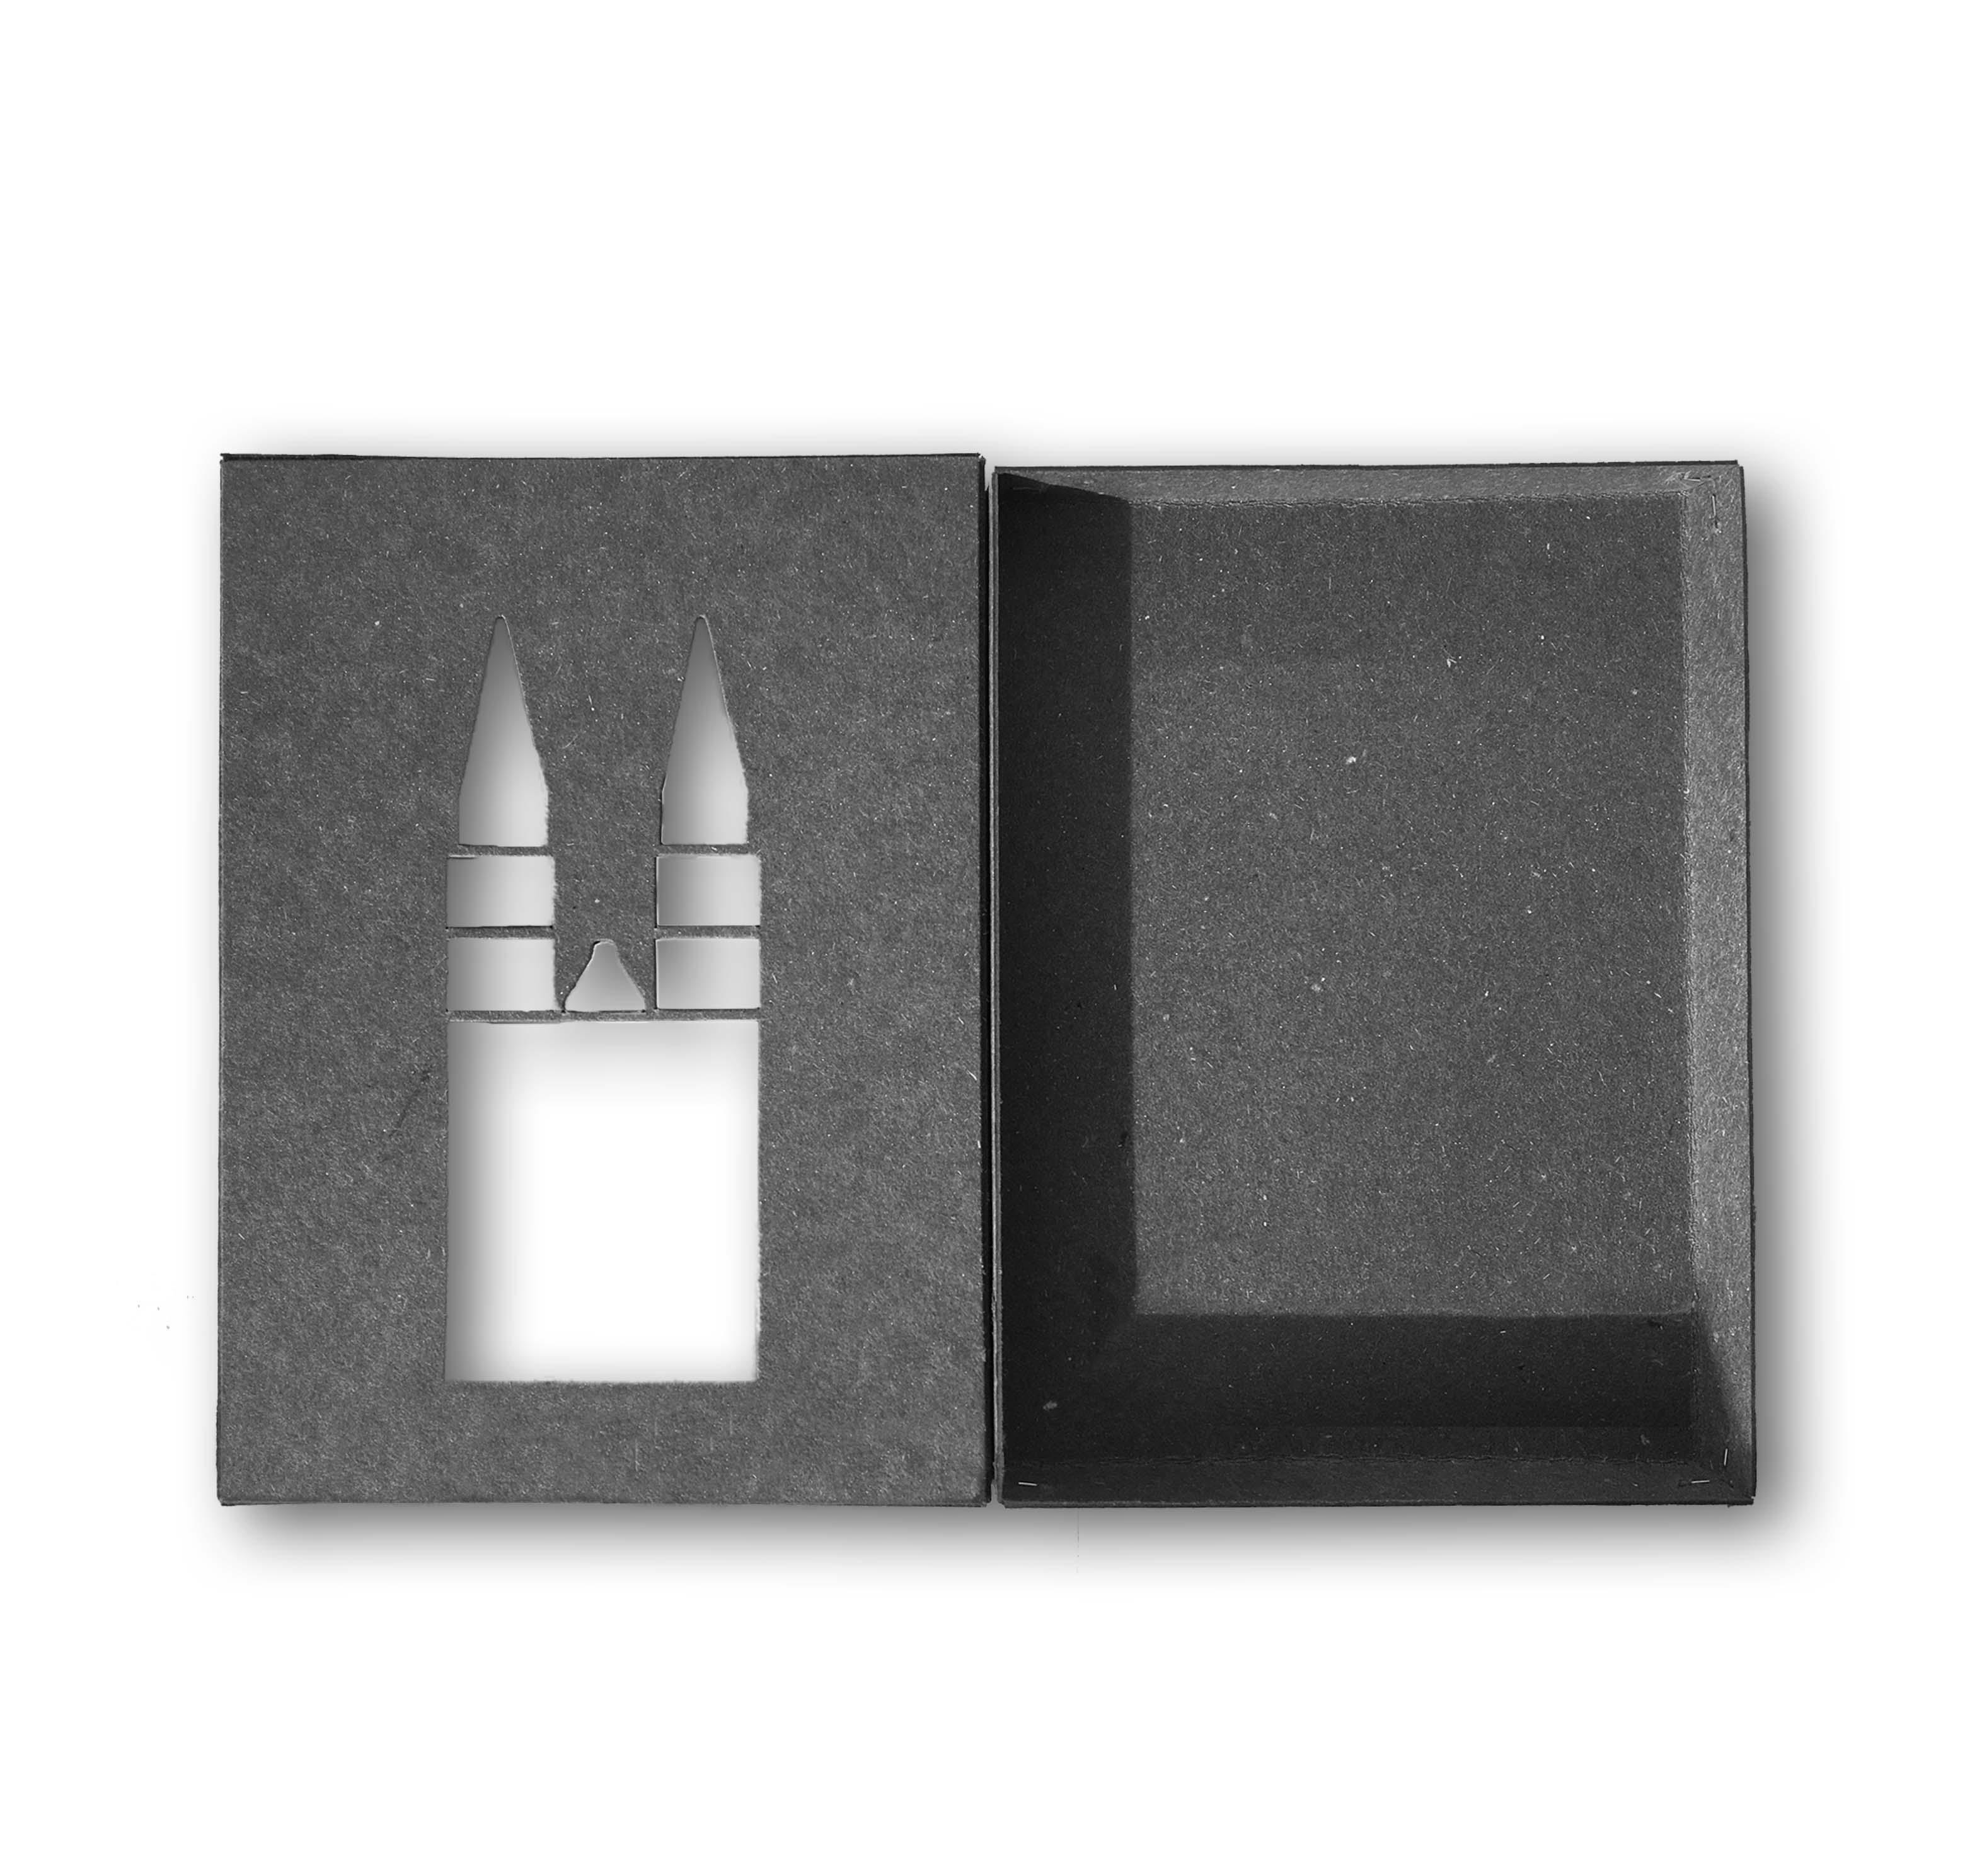 Lorenzer Box